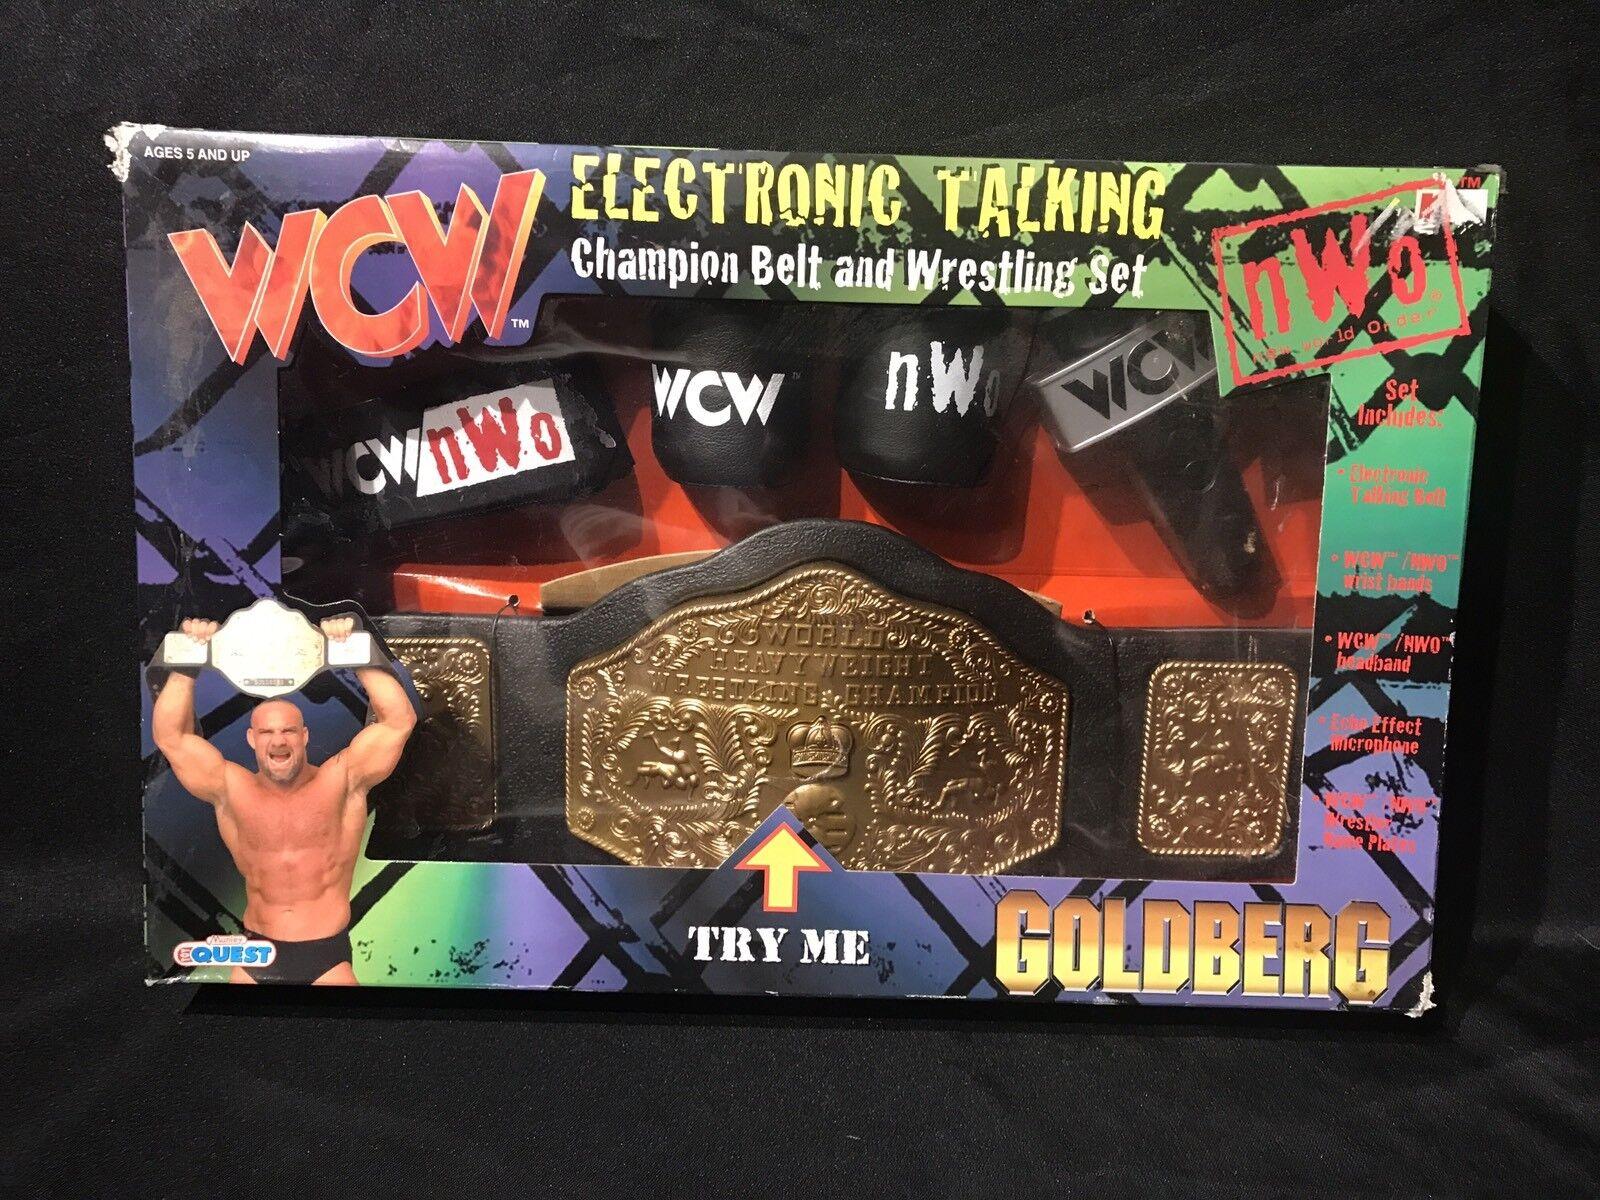 1998 WCW orberg Electronic talking Champion Ceinture & Wrestling Set Nouveau